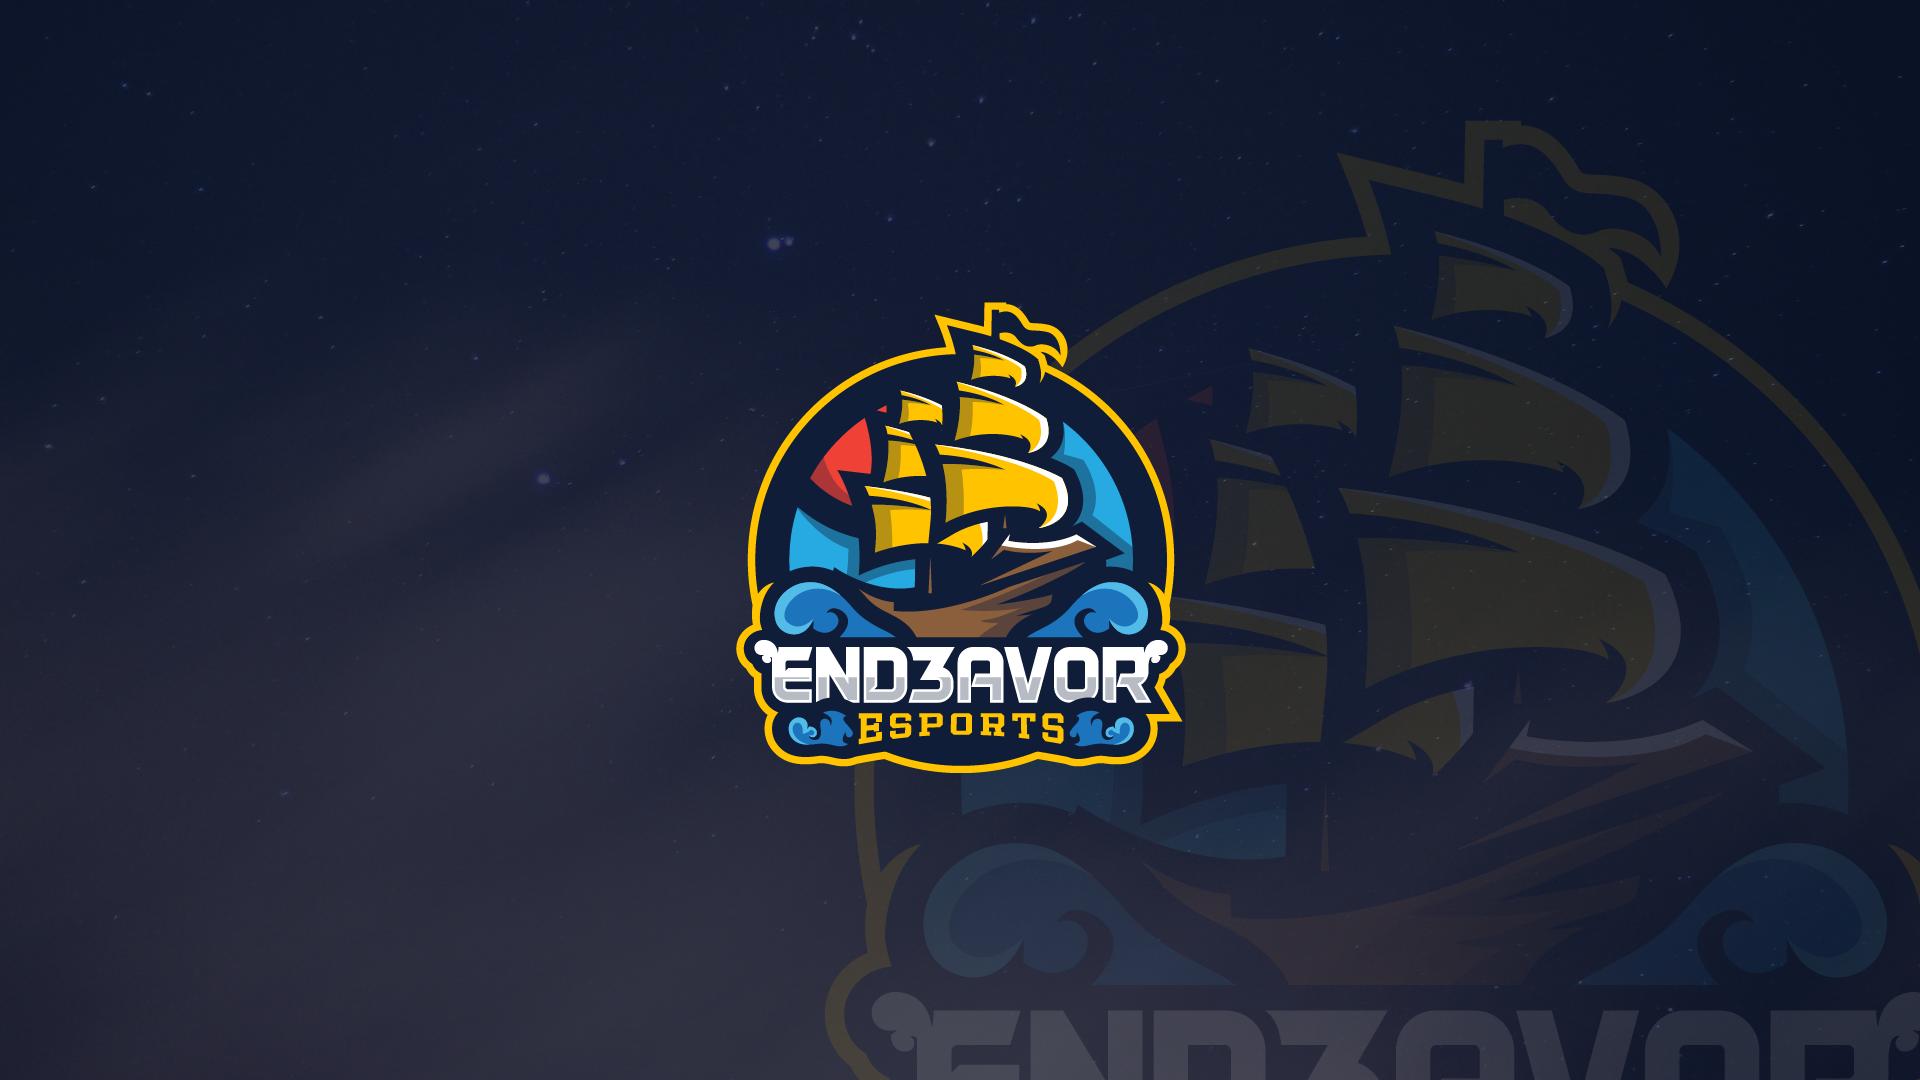 Endeavor Esports